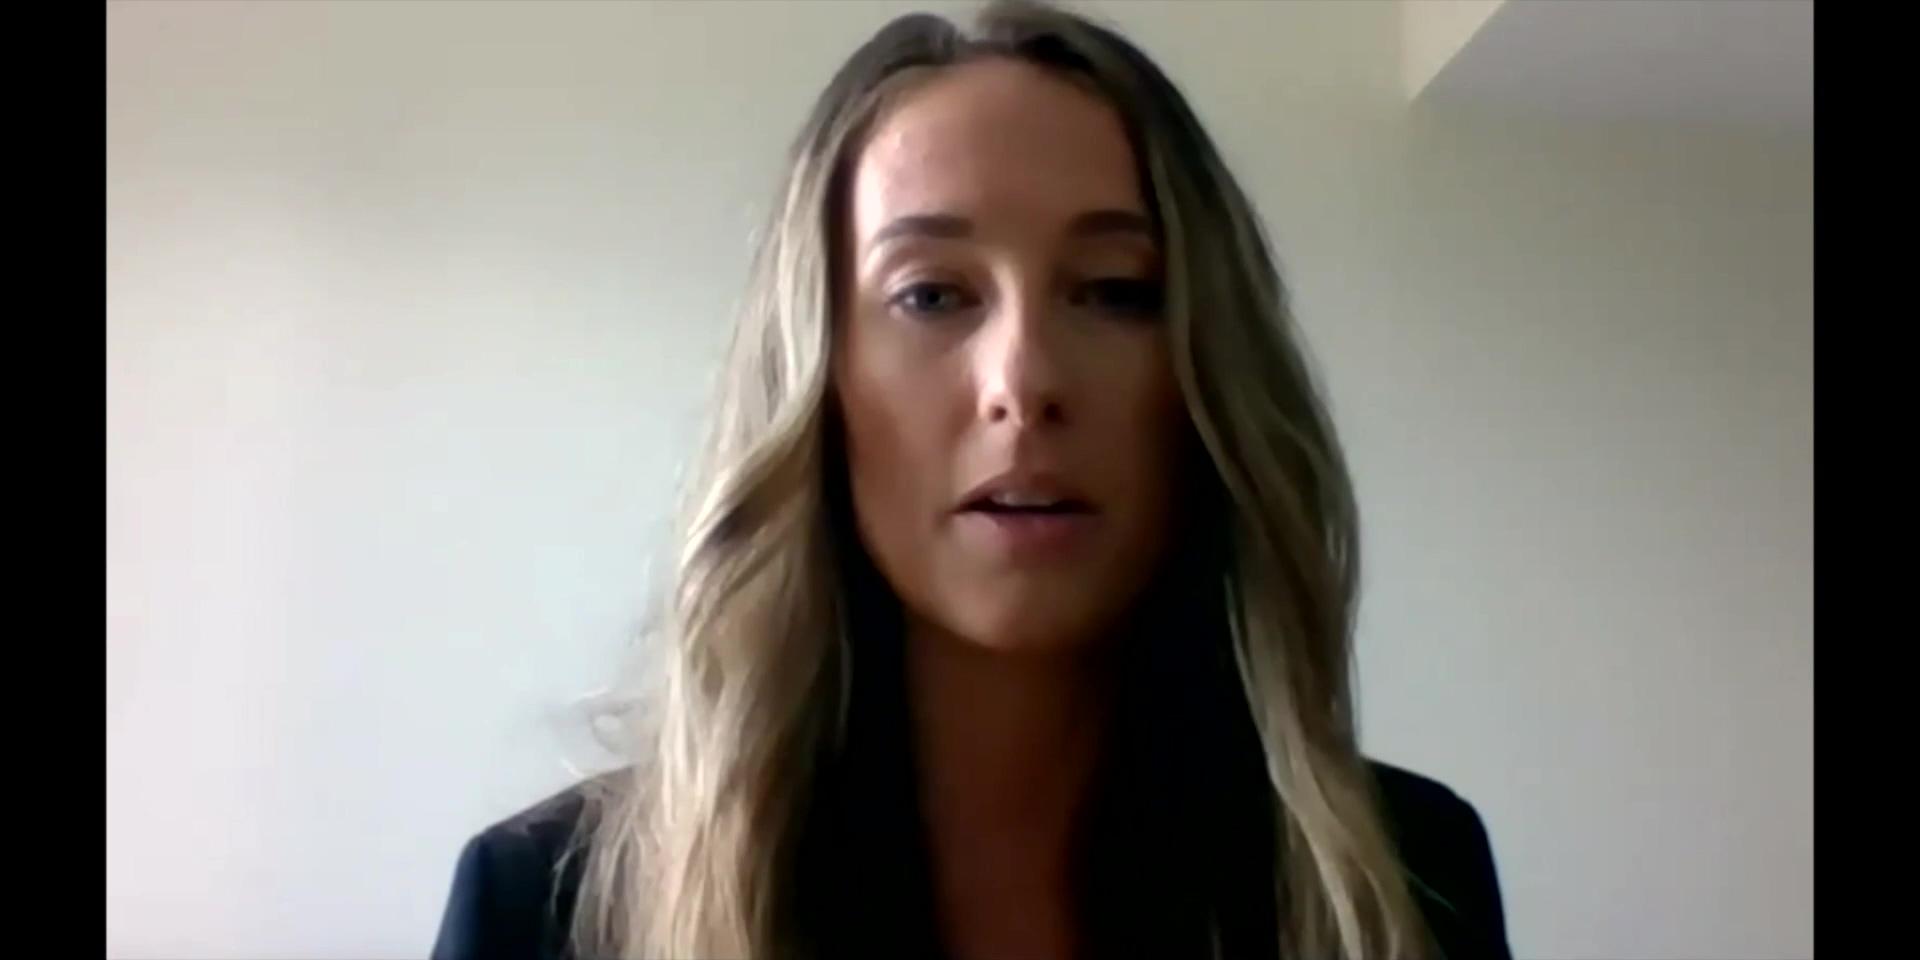 Sarah Testimonial (New)